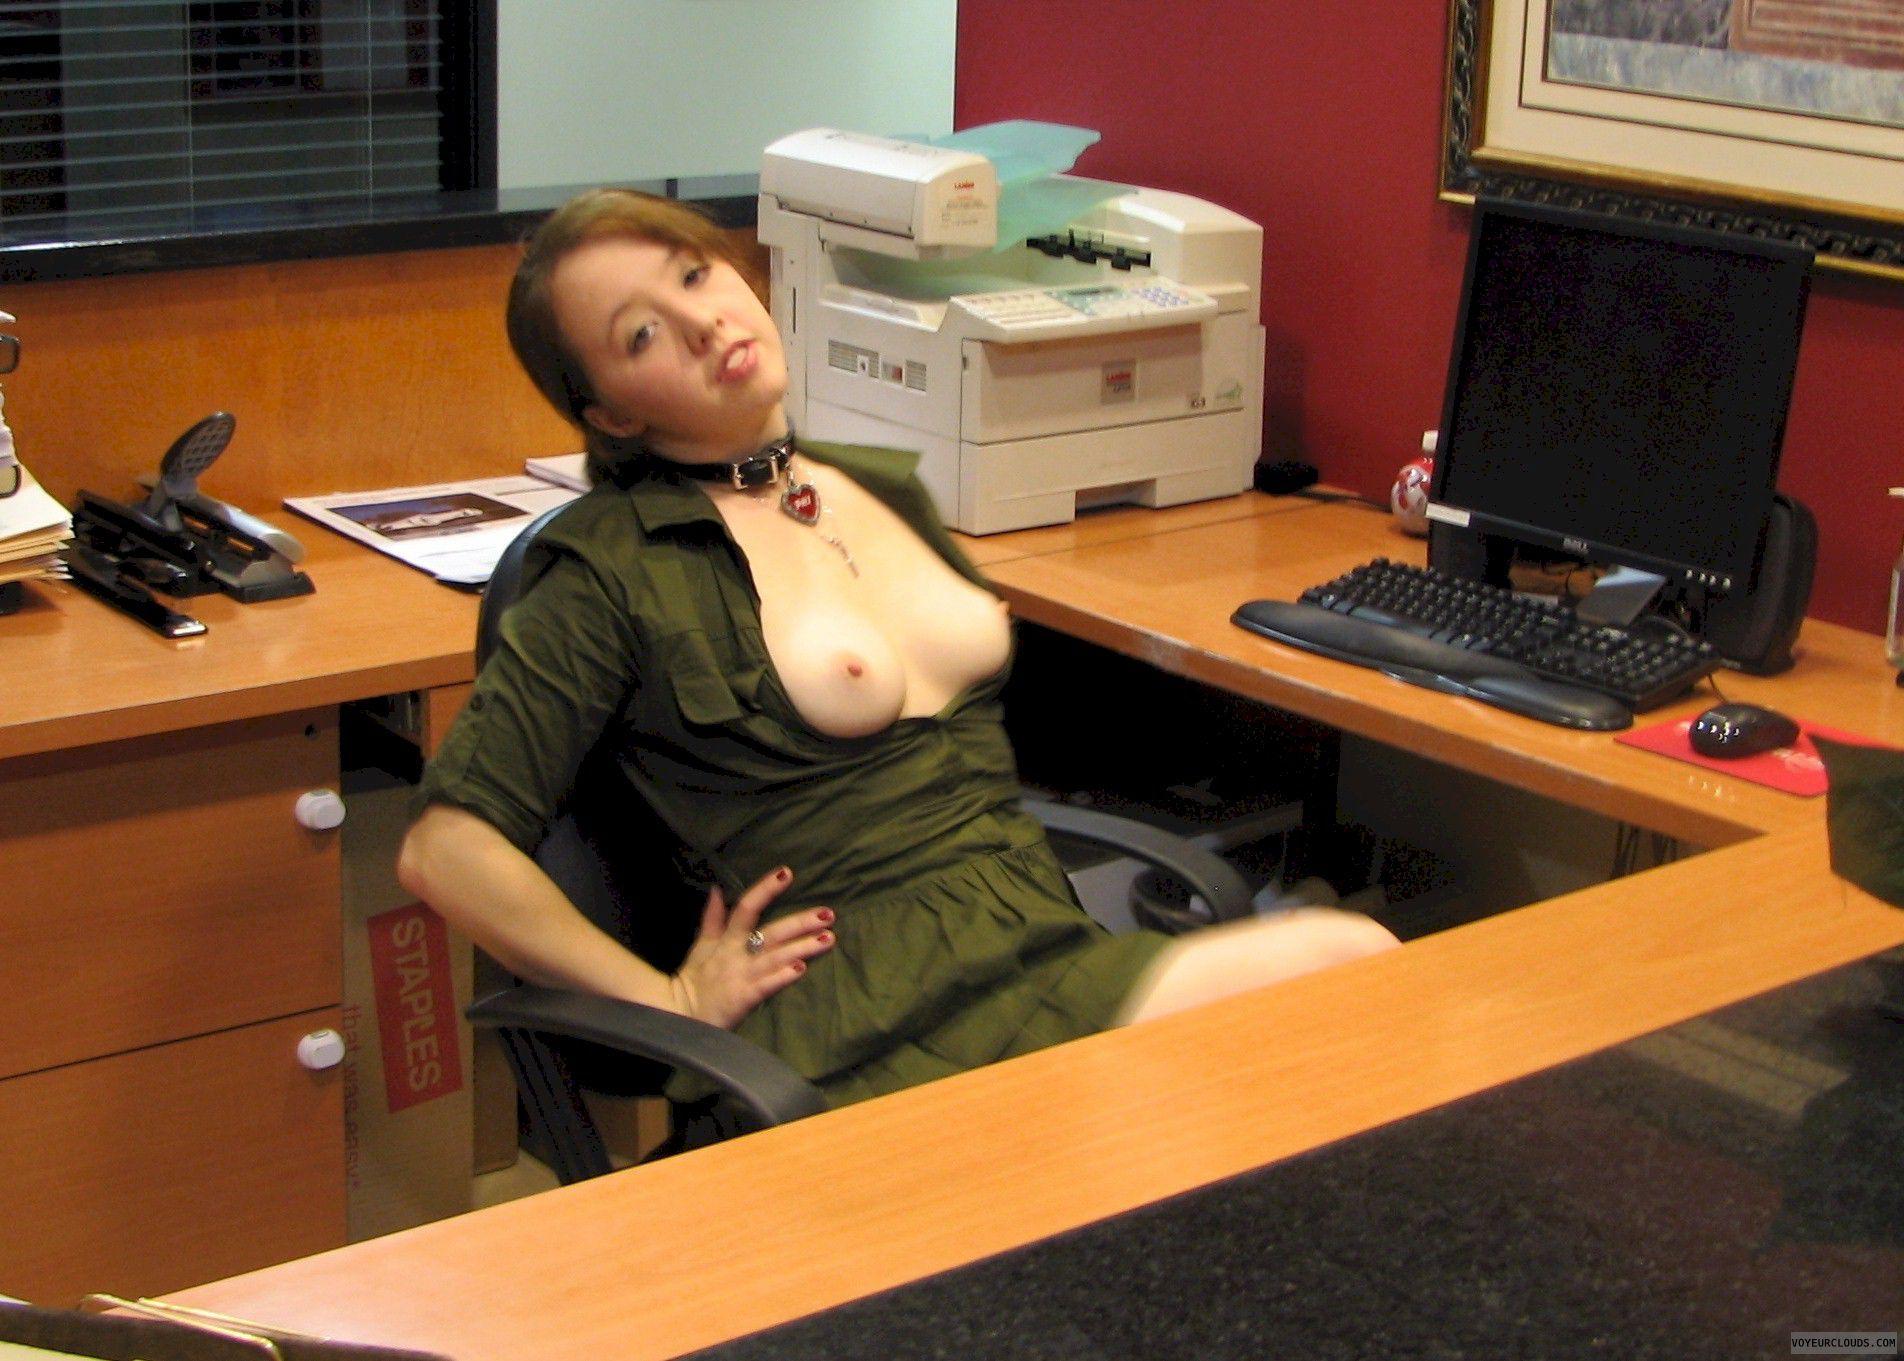 Li\'l Φhi At The Office Christmas Party: Erotic Amateur Art Pics